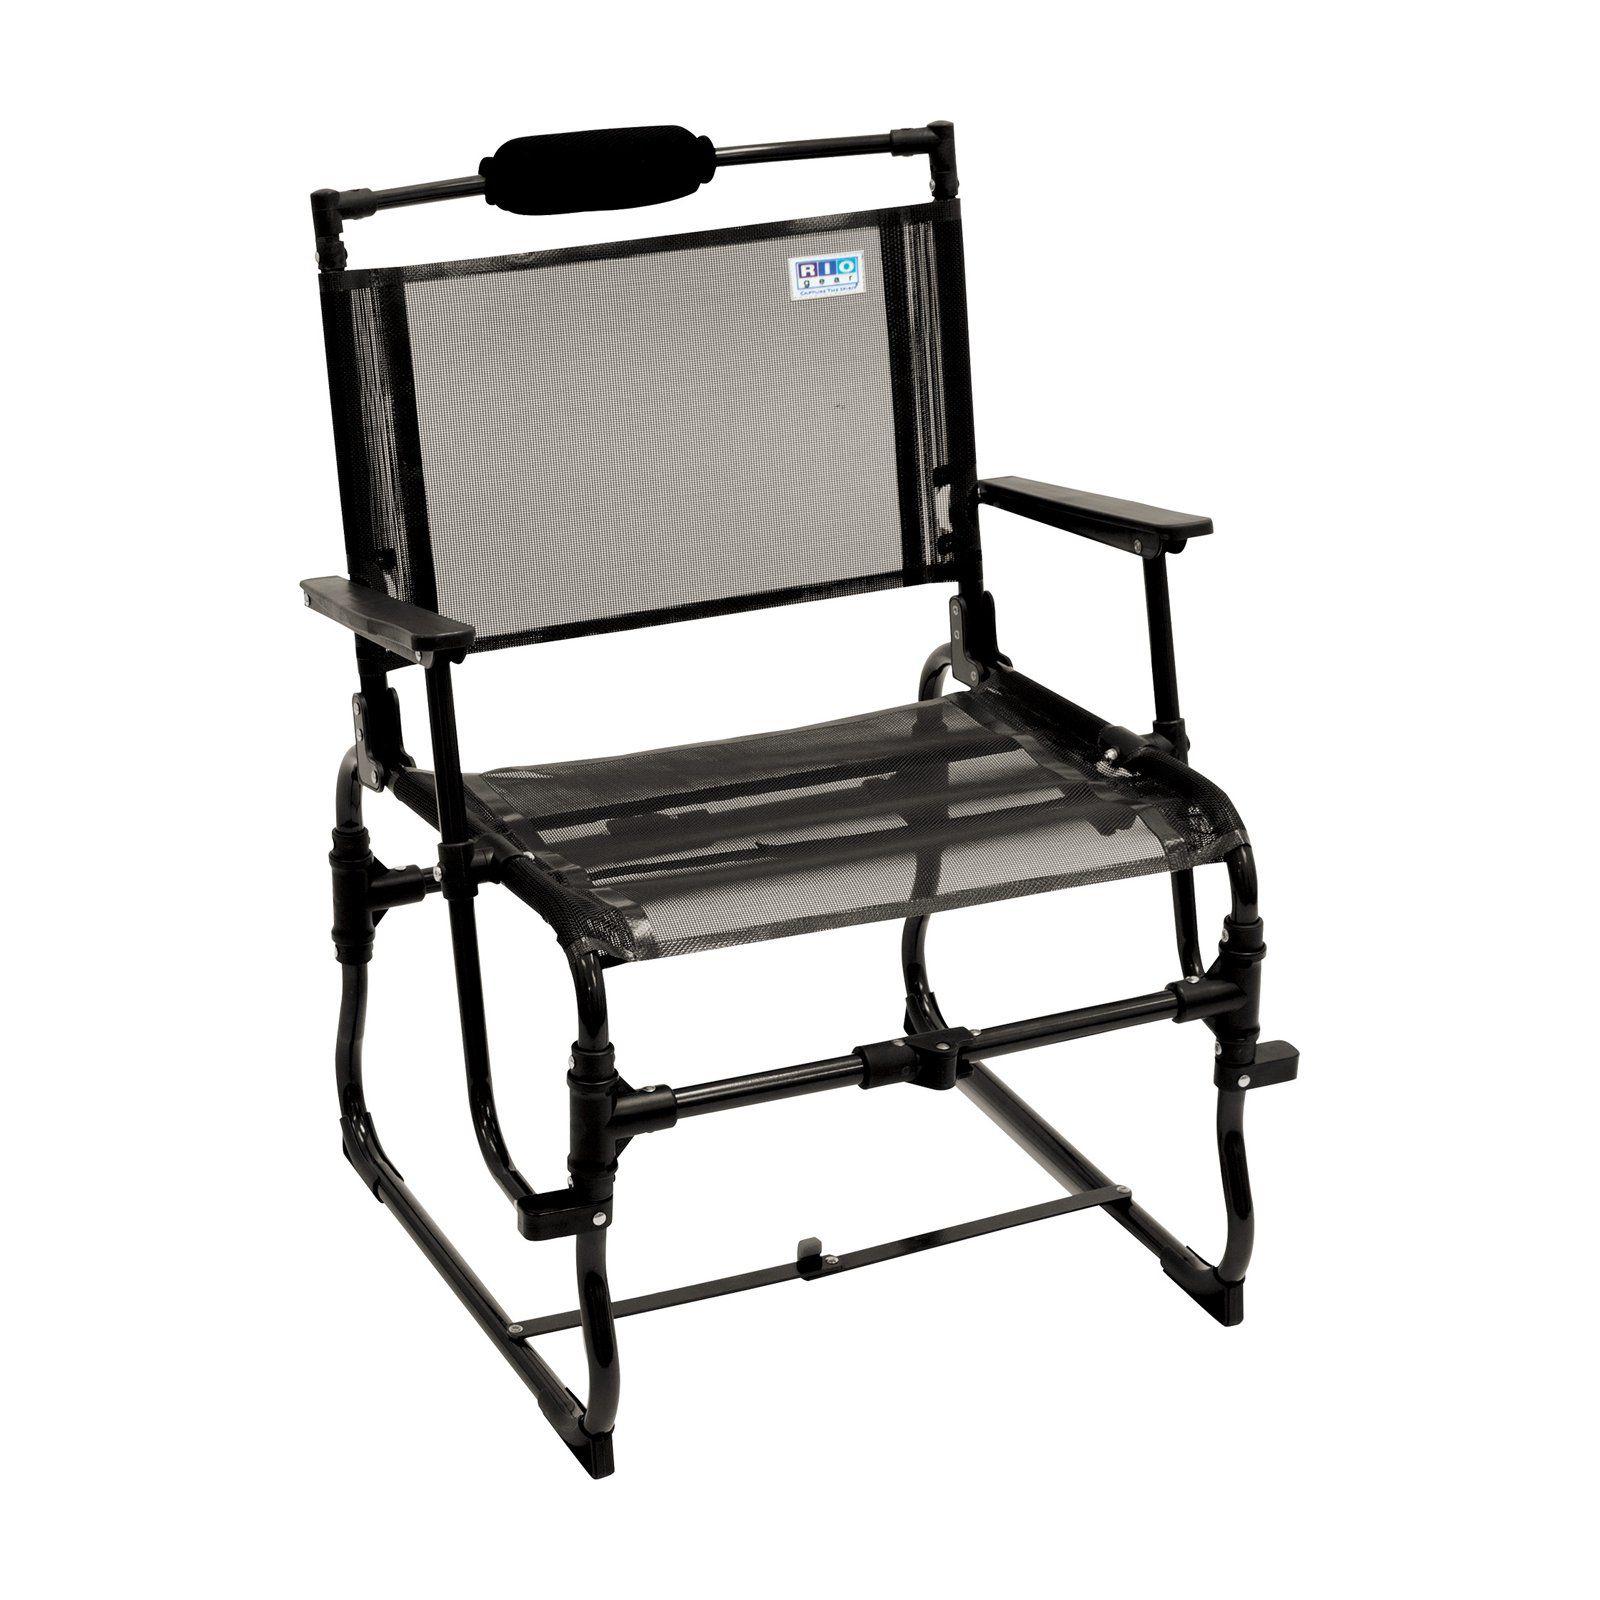 Outdoor Rio Gear Compact Traveler Folding Chair Large Folding